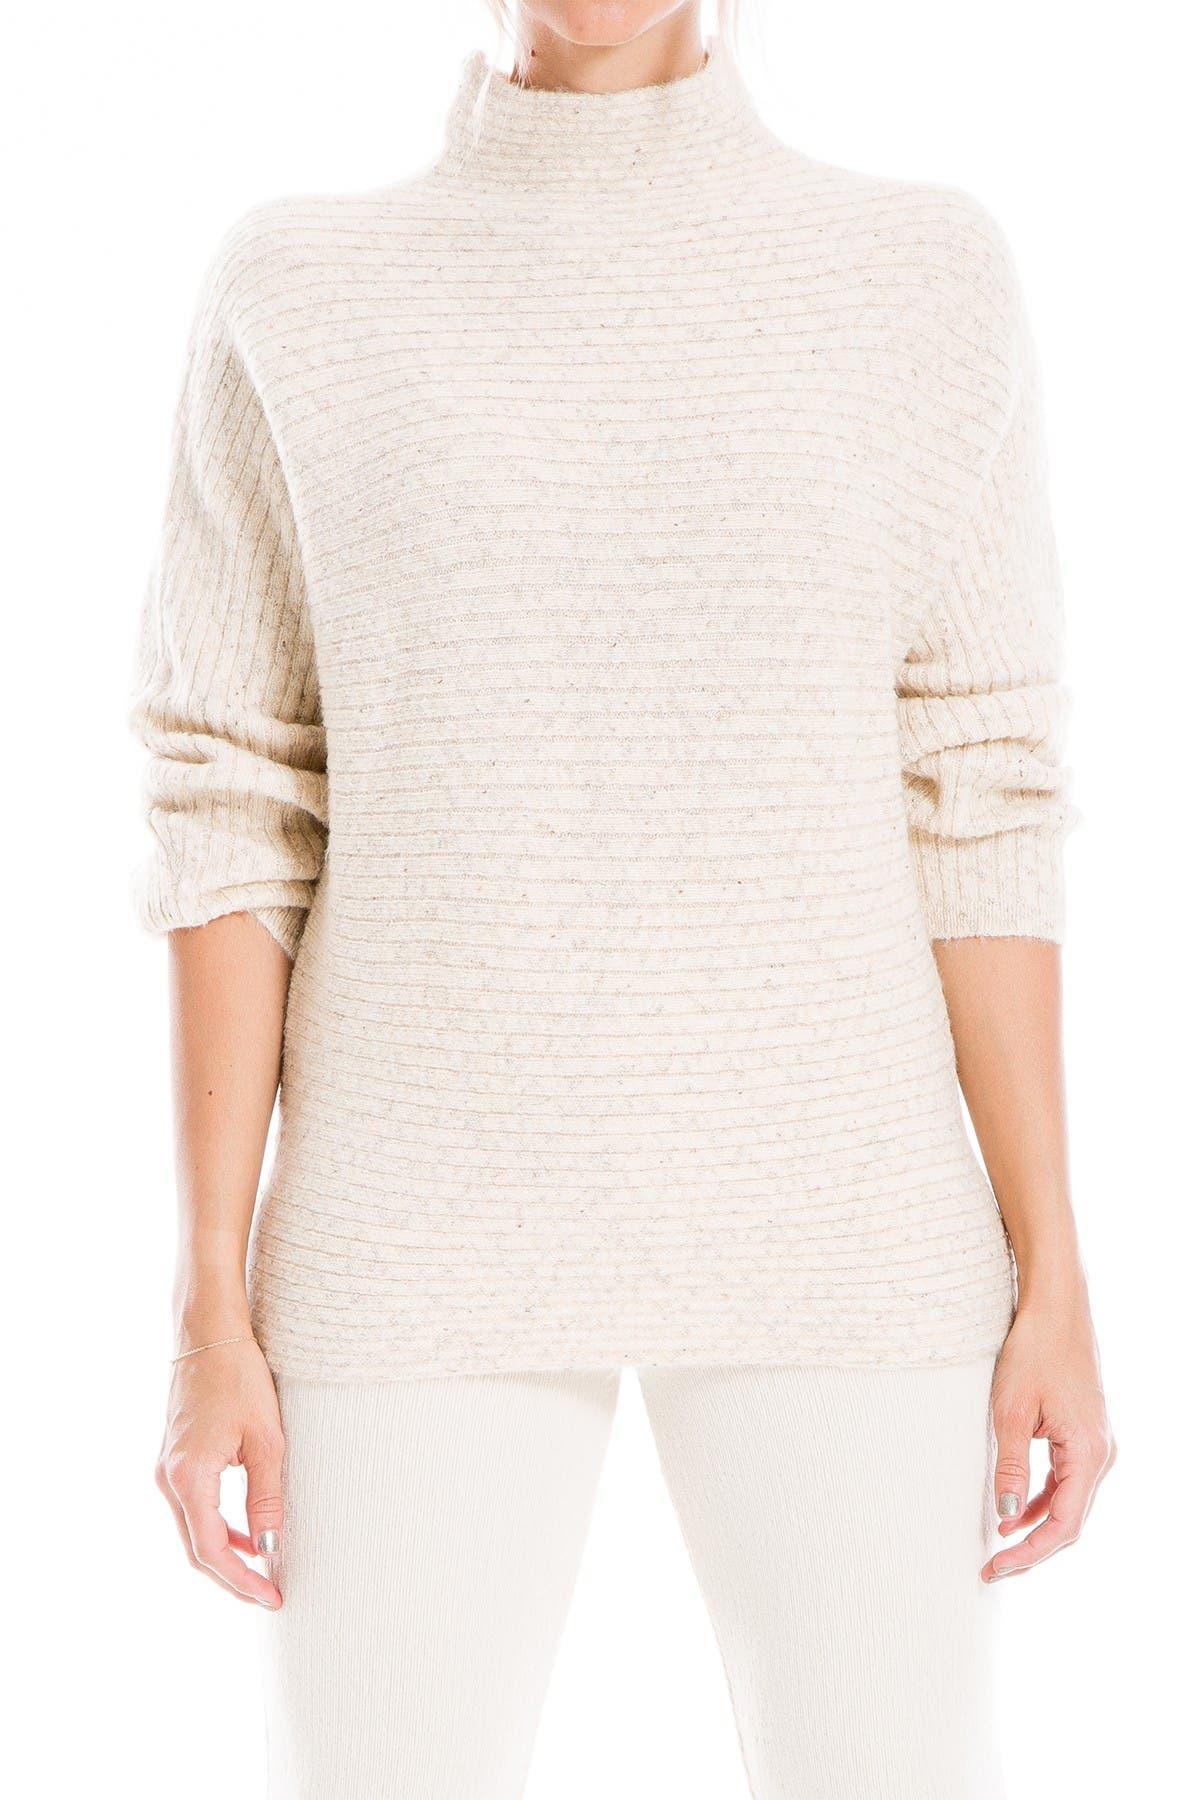 Image of Max Studio Marled Mock Neck Sweater